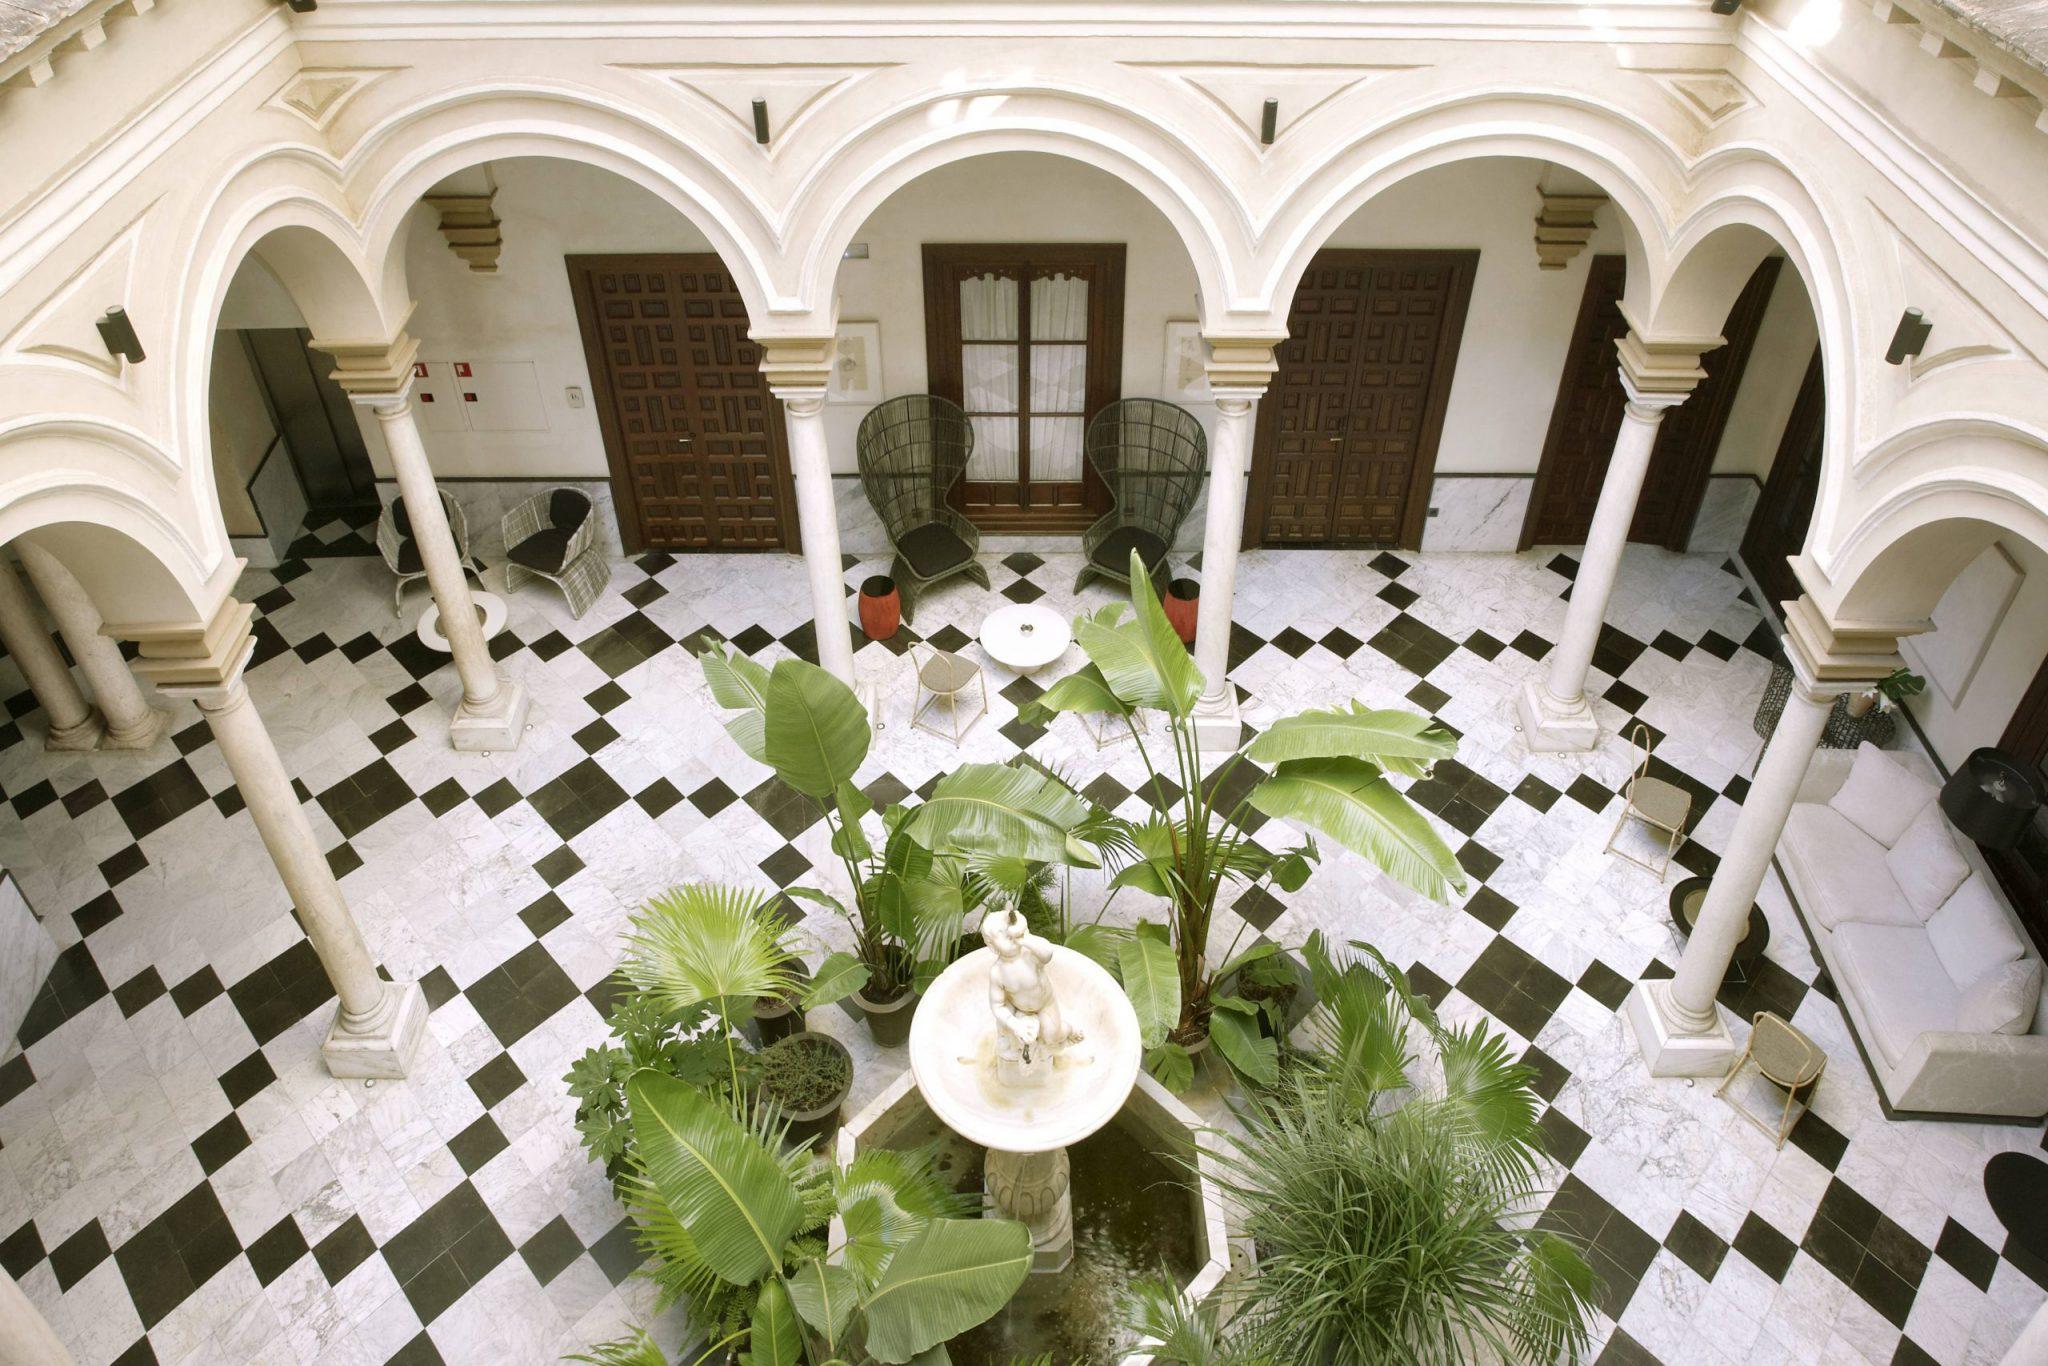 Palacio-Main-Courtyard-4-1-scaled.jpg